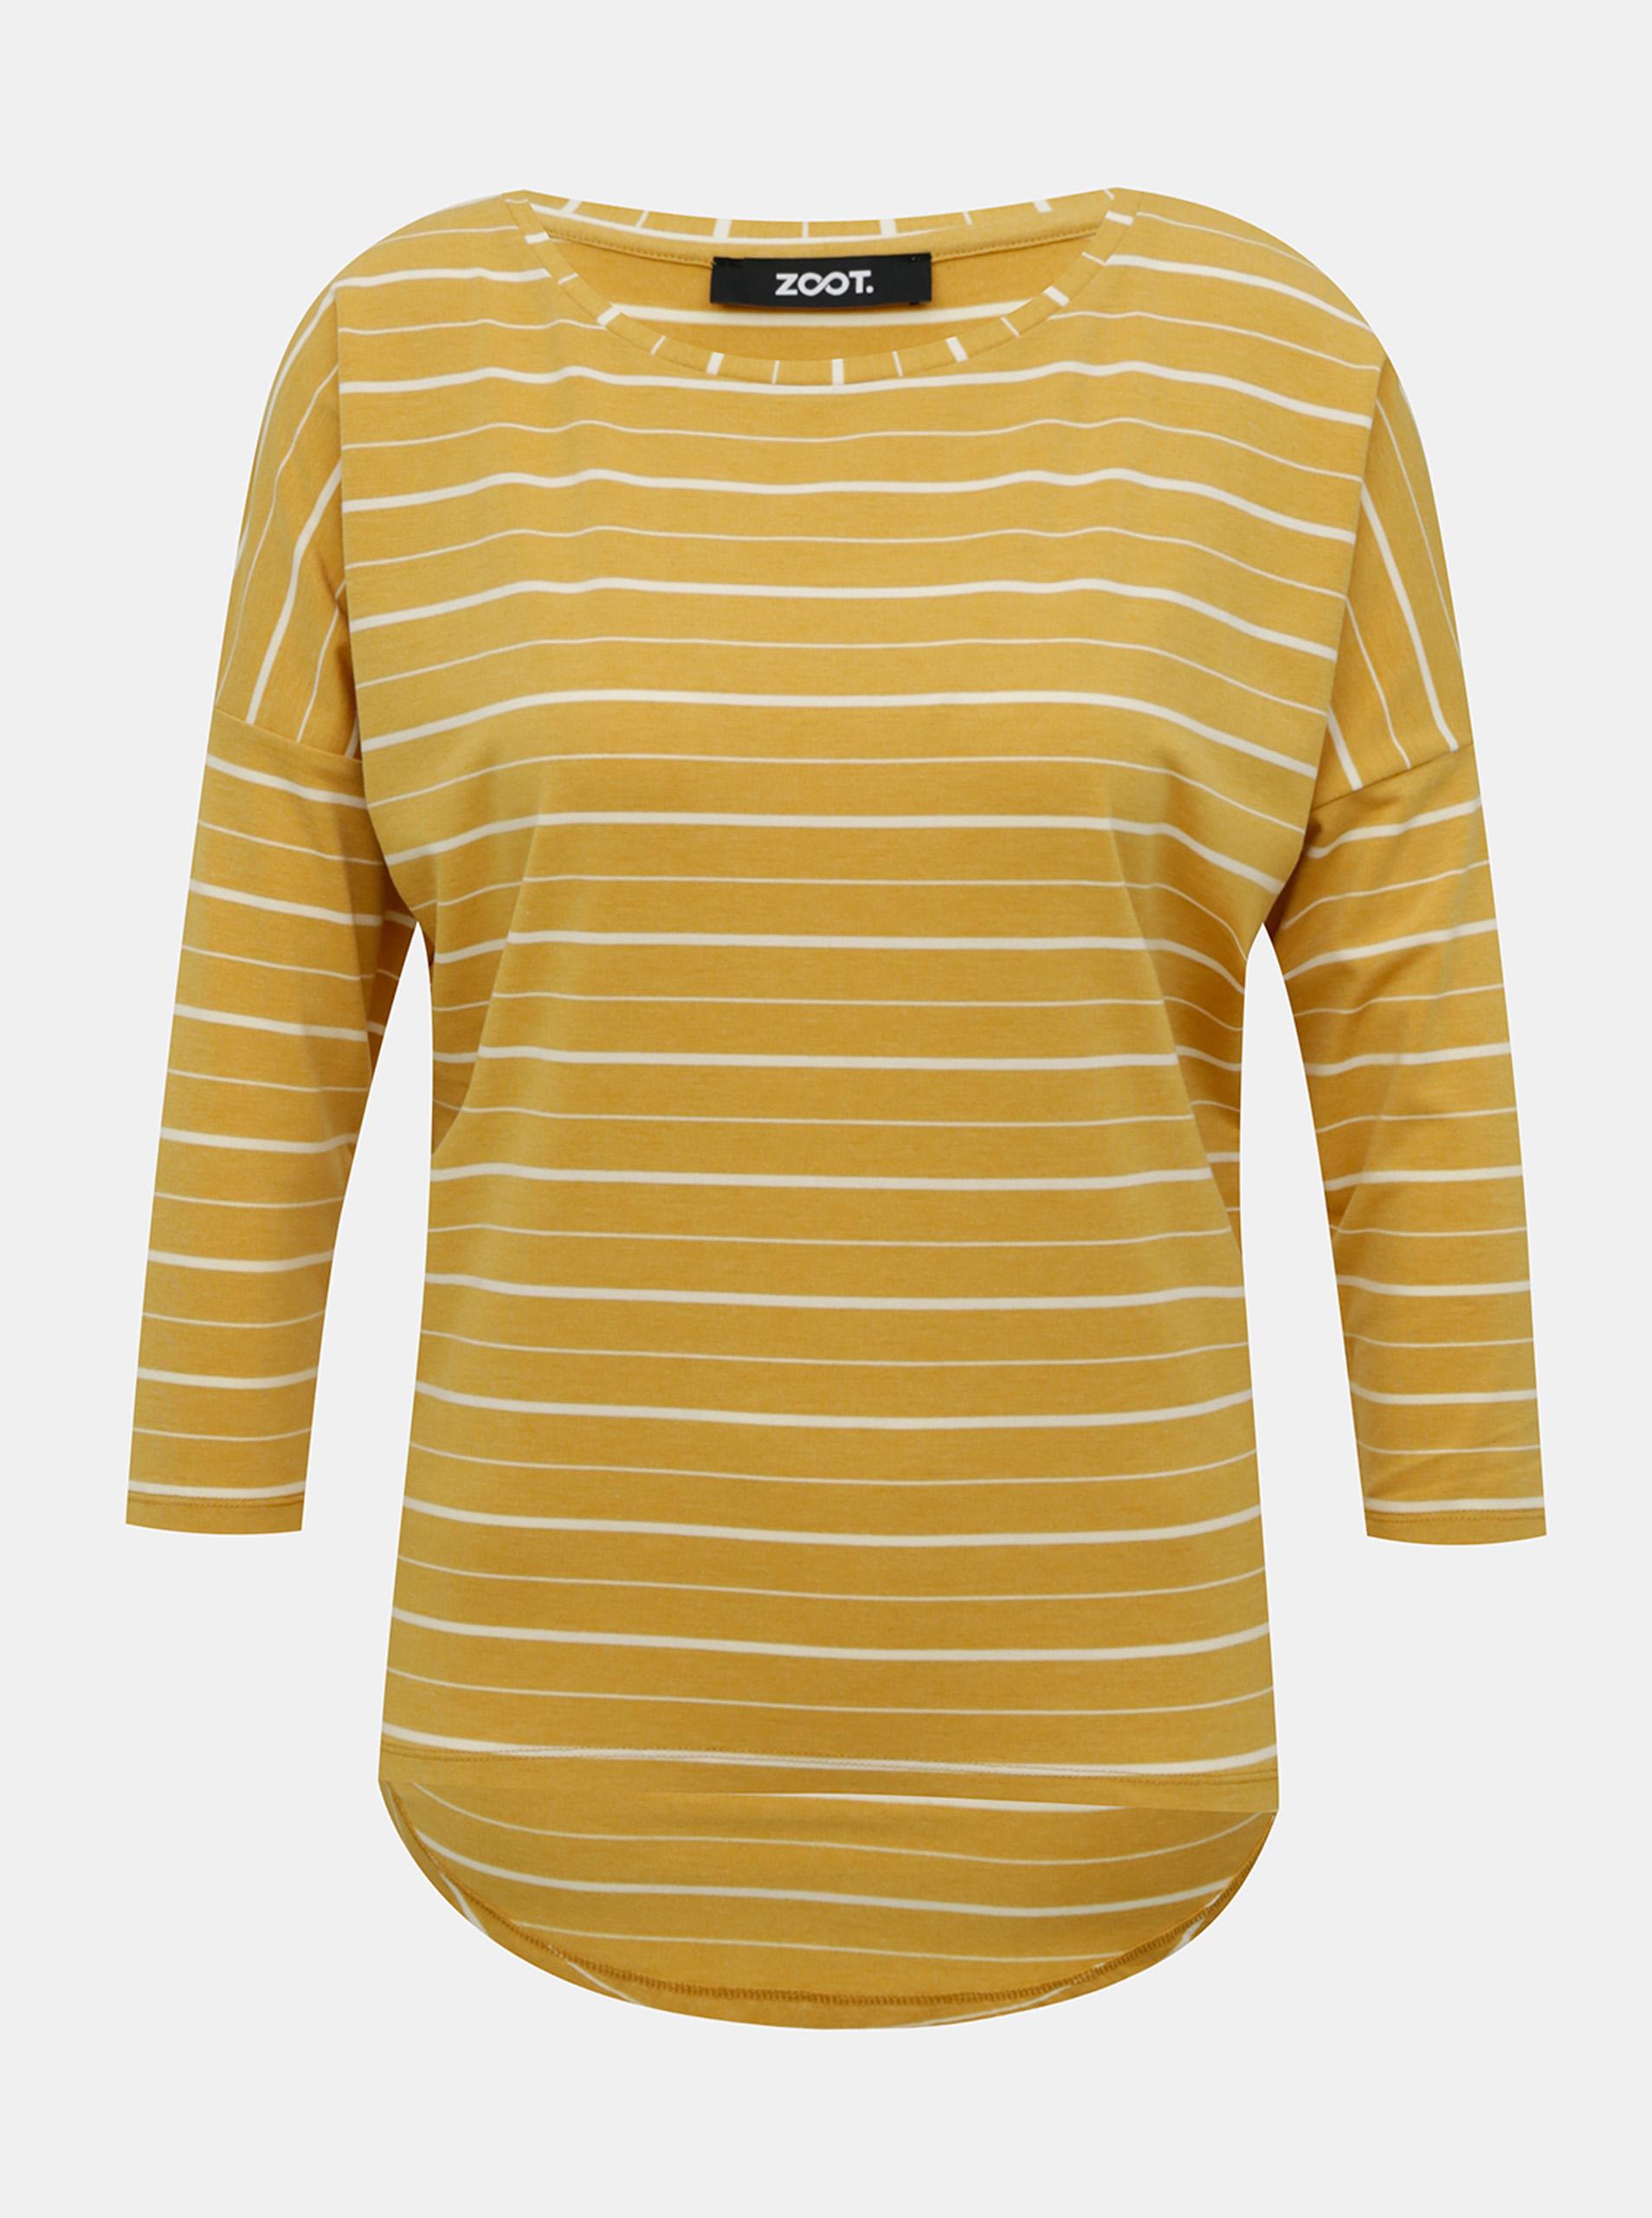 ZOOT yellow T-shirt Kleopatra